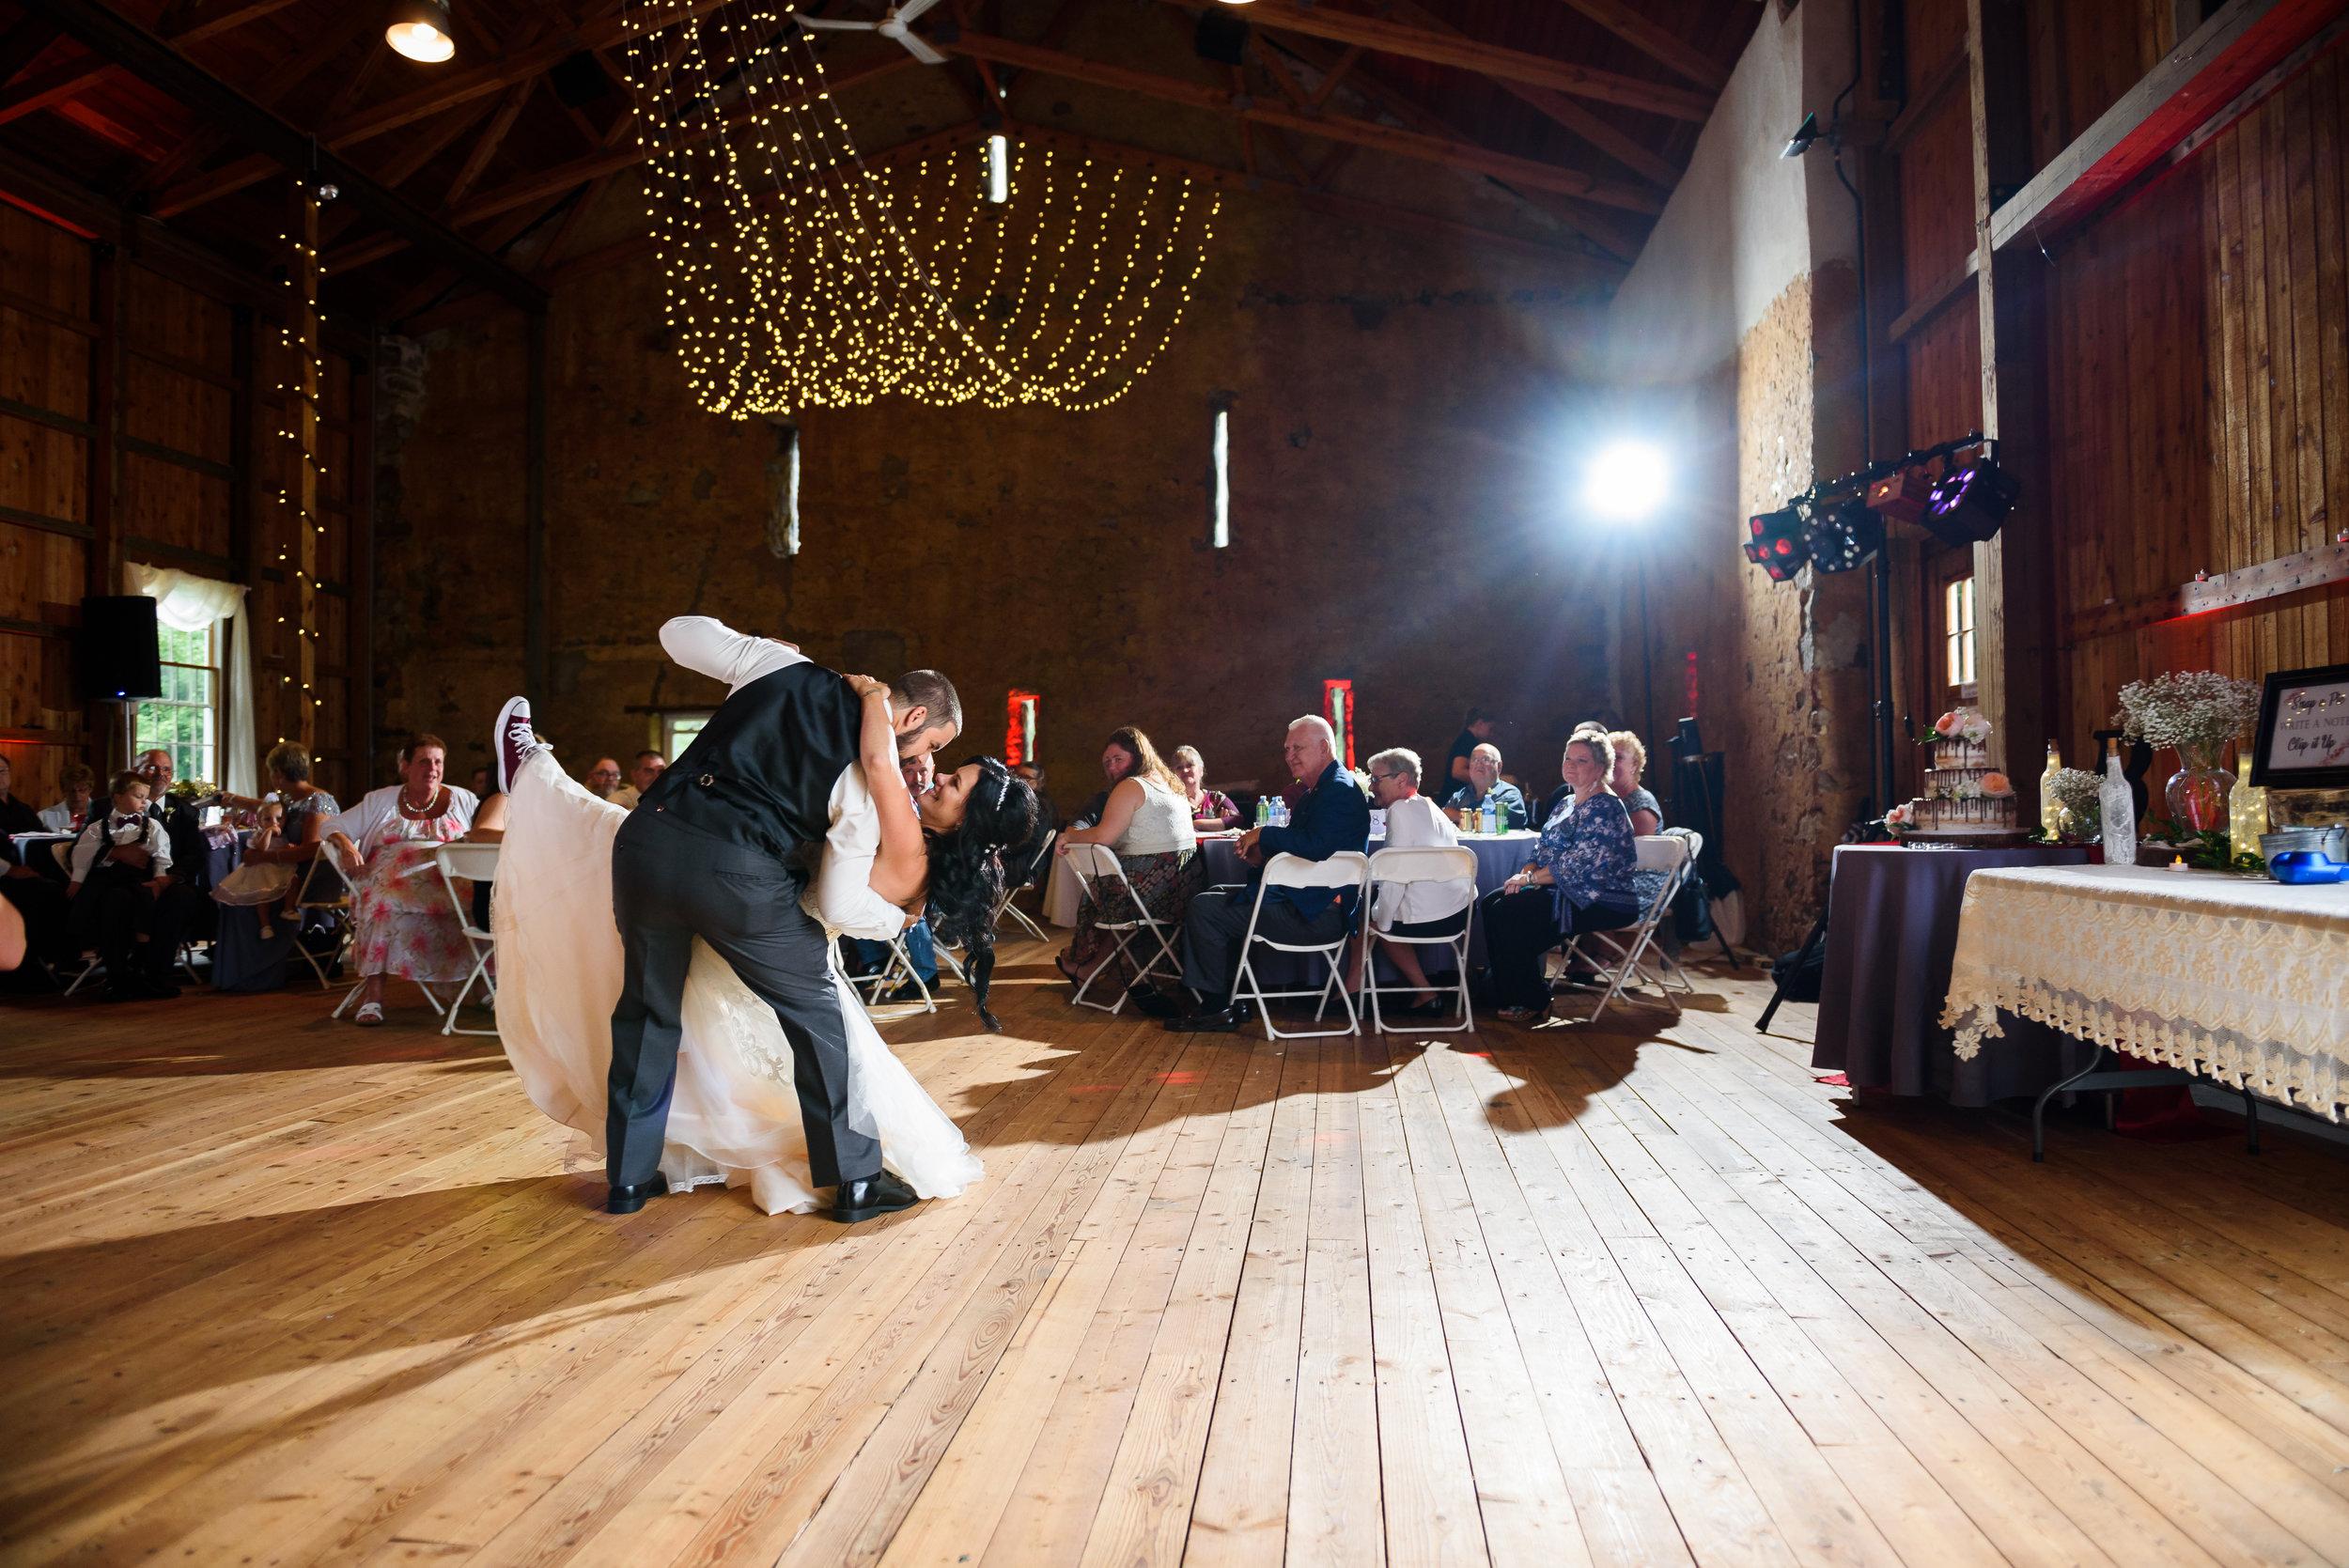 Heather-Jared-Wedding-Garcia-Photography-8235.jpg